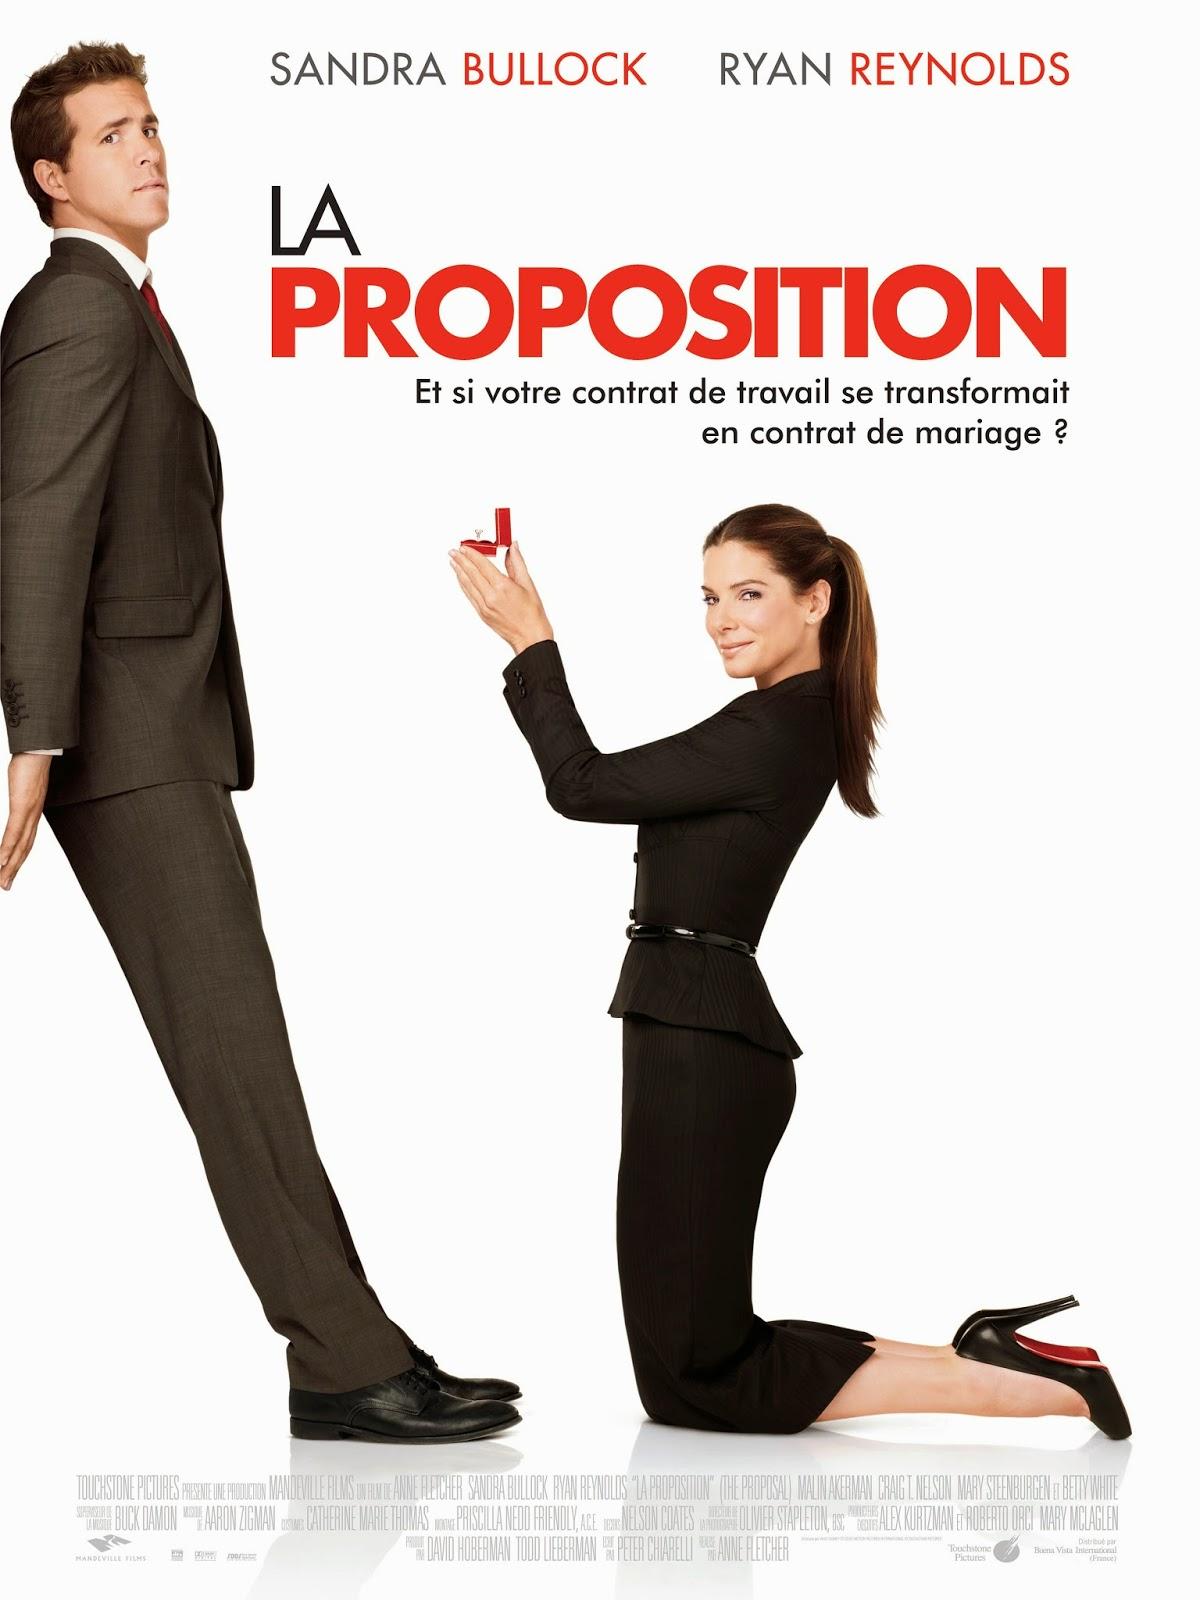 http://4.bp.blogspot.com/-1Nxk5XqhW68/VAXc8tnGqiI/AAAAAAAAAmY/yN0AWpnrFcA/s1600/La_proposicion_-_The_proposal_-_tt1041829_-_fr_a.JPG